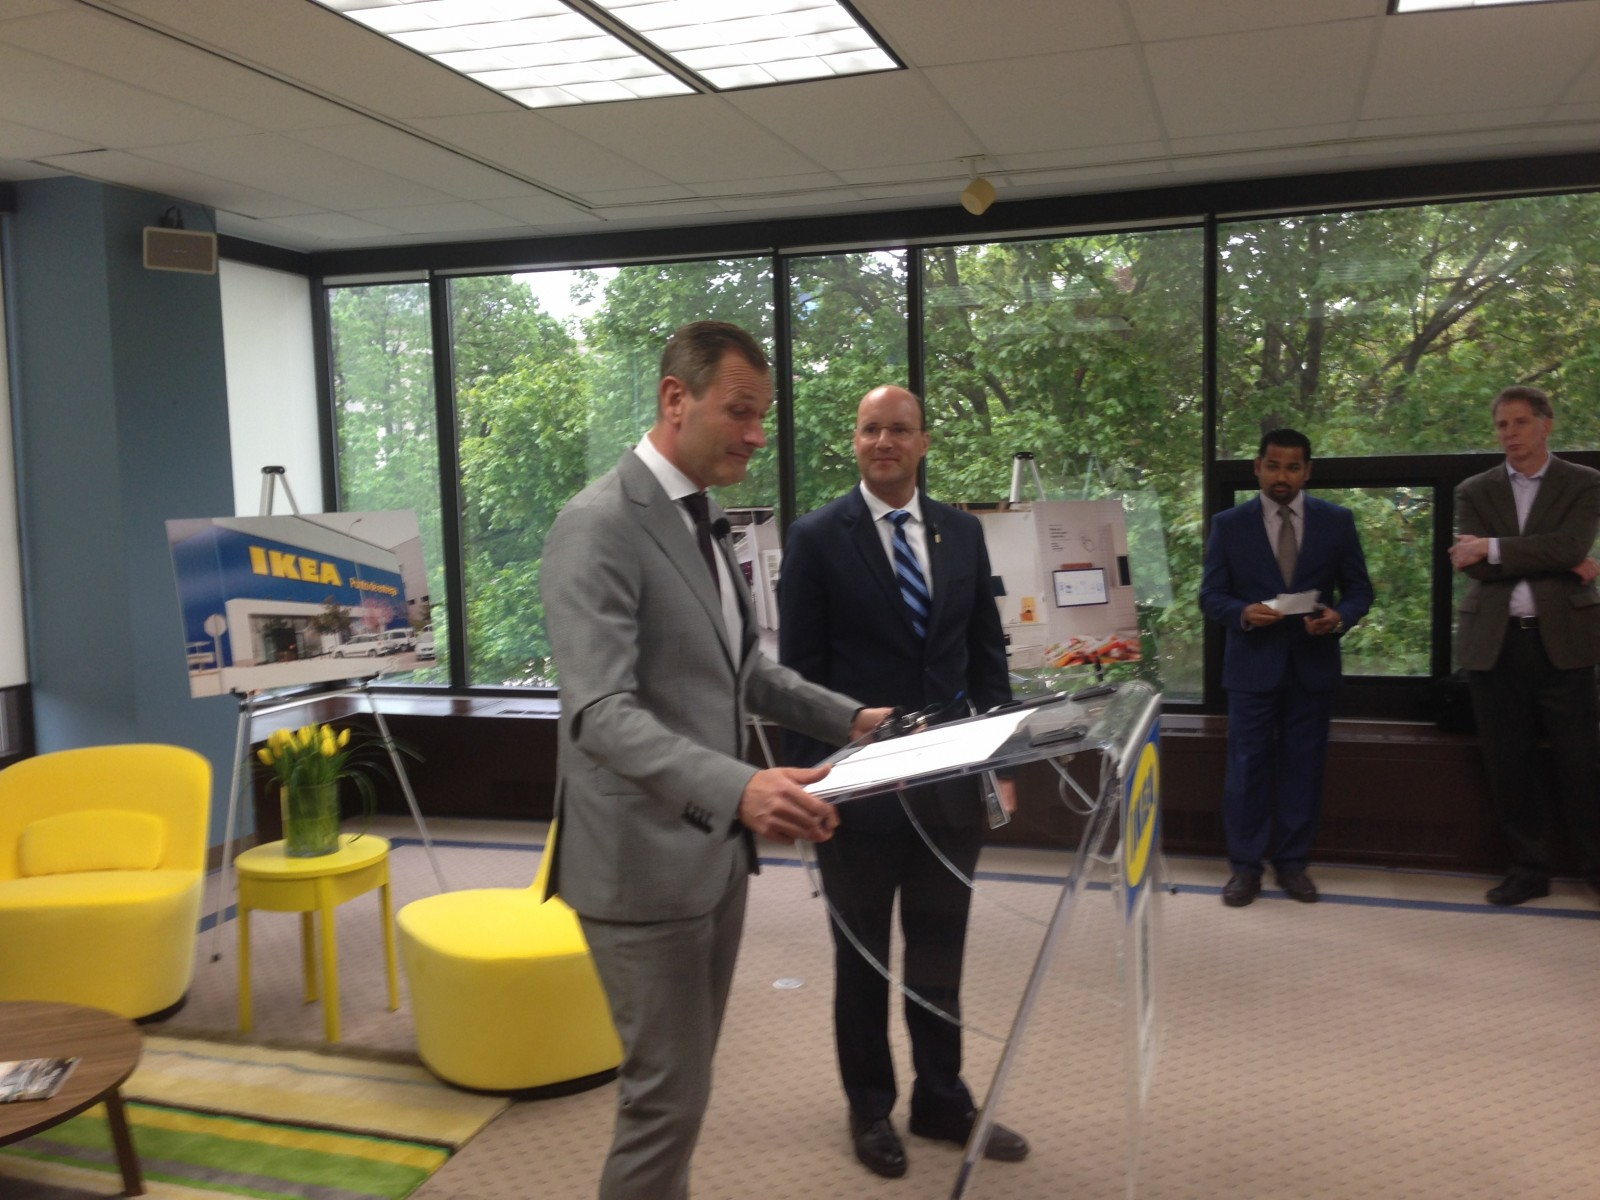 IKEA to open pilot store in London